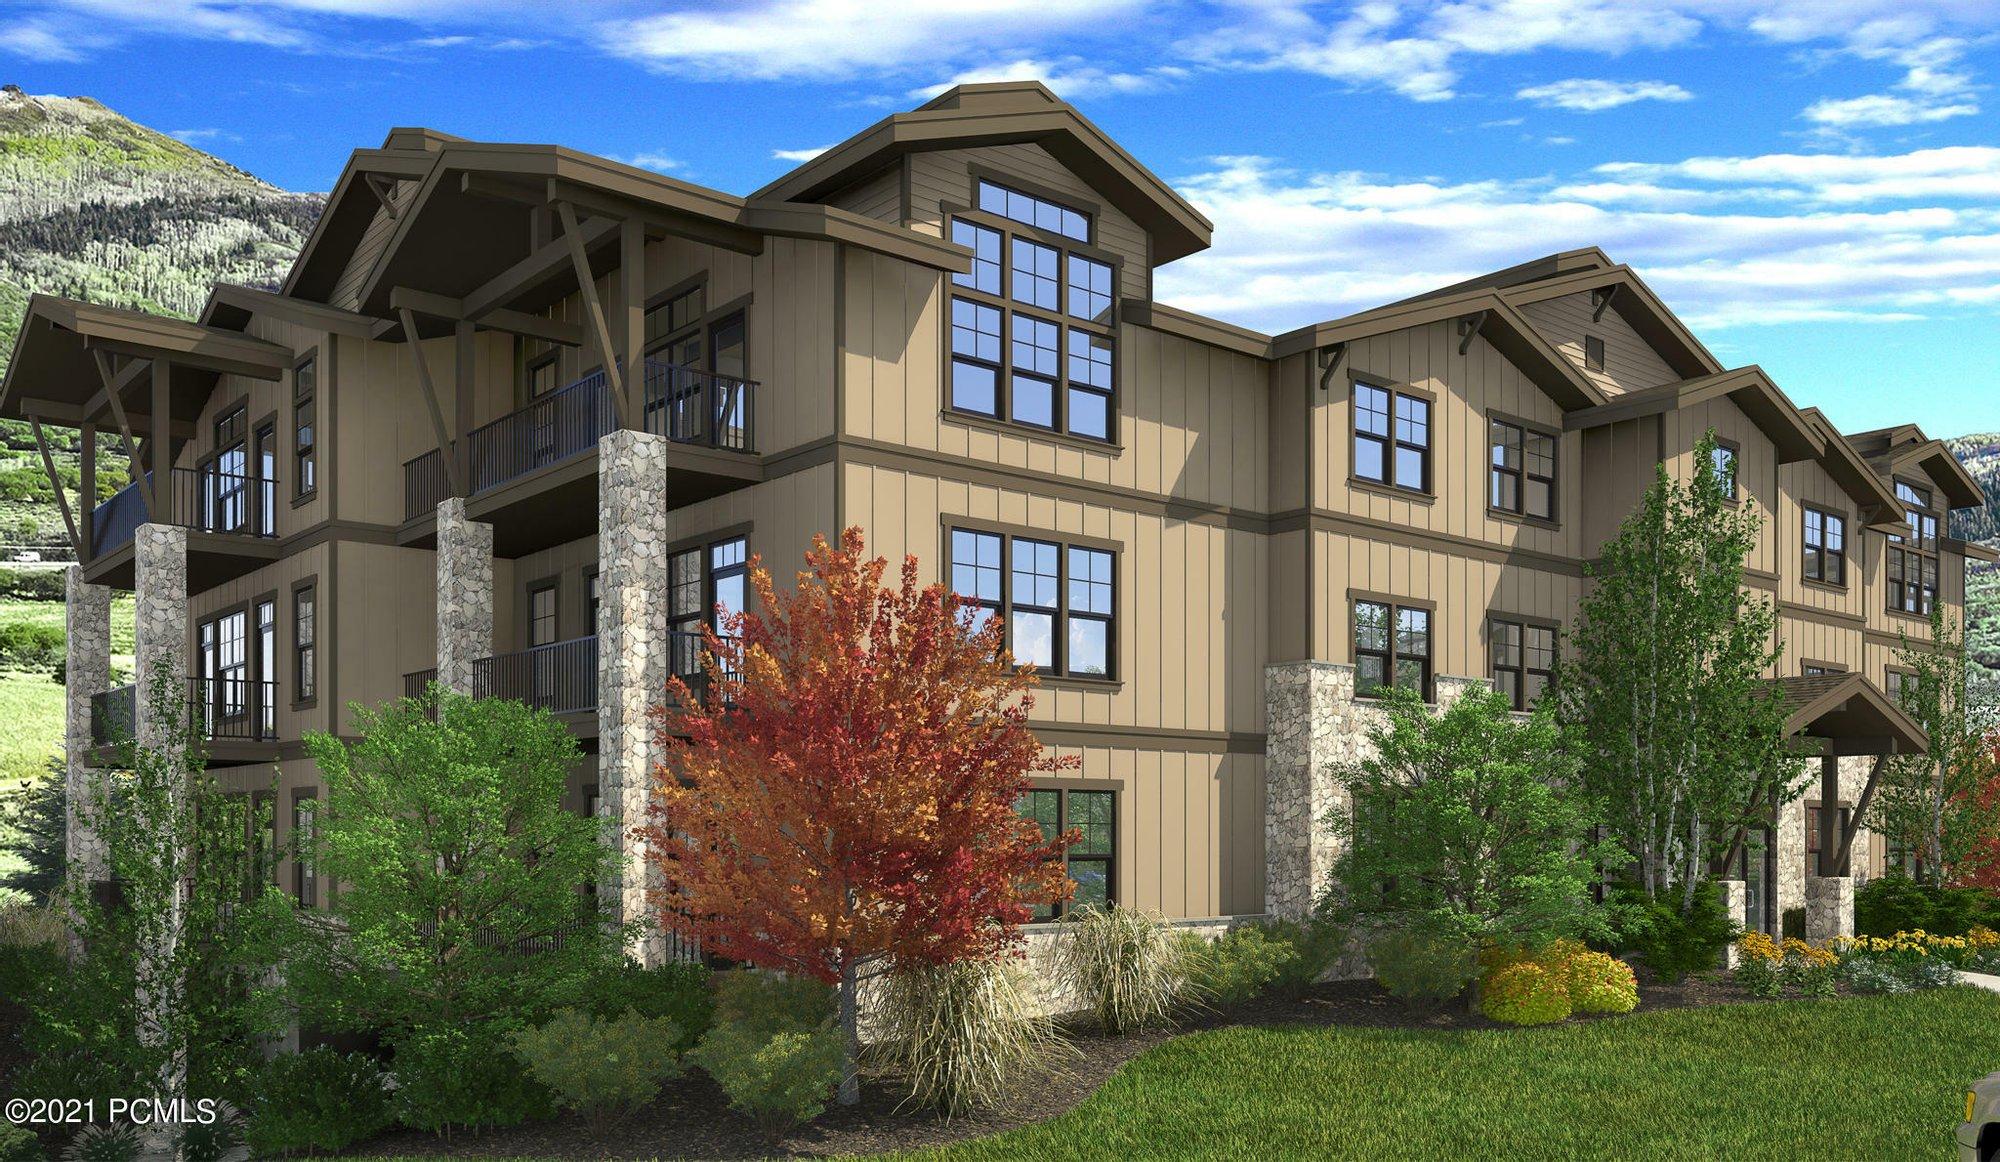 Appartamento a Heber City, Utah, Stati Uniti 1 - 11438109